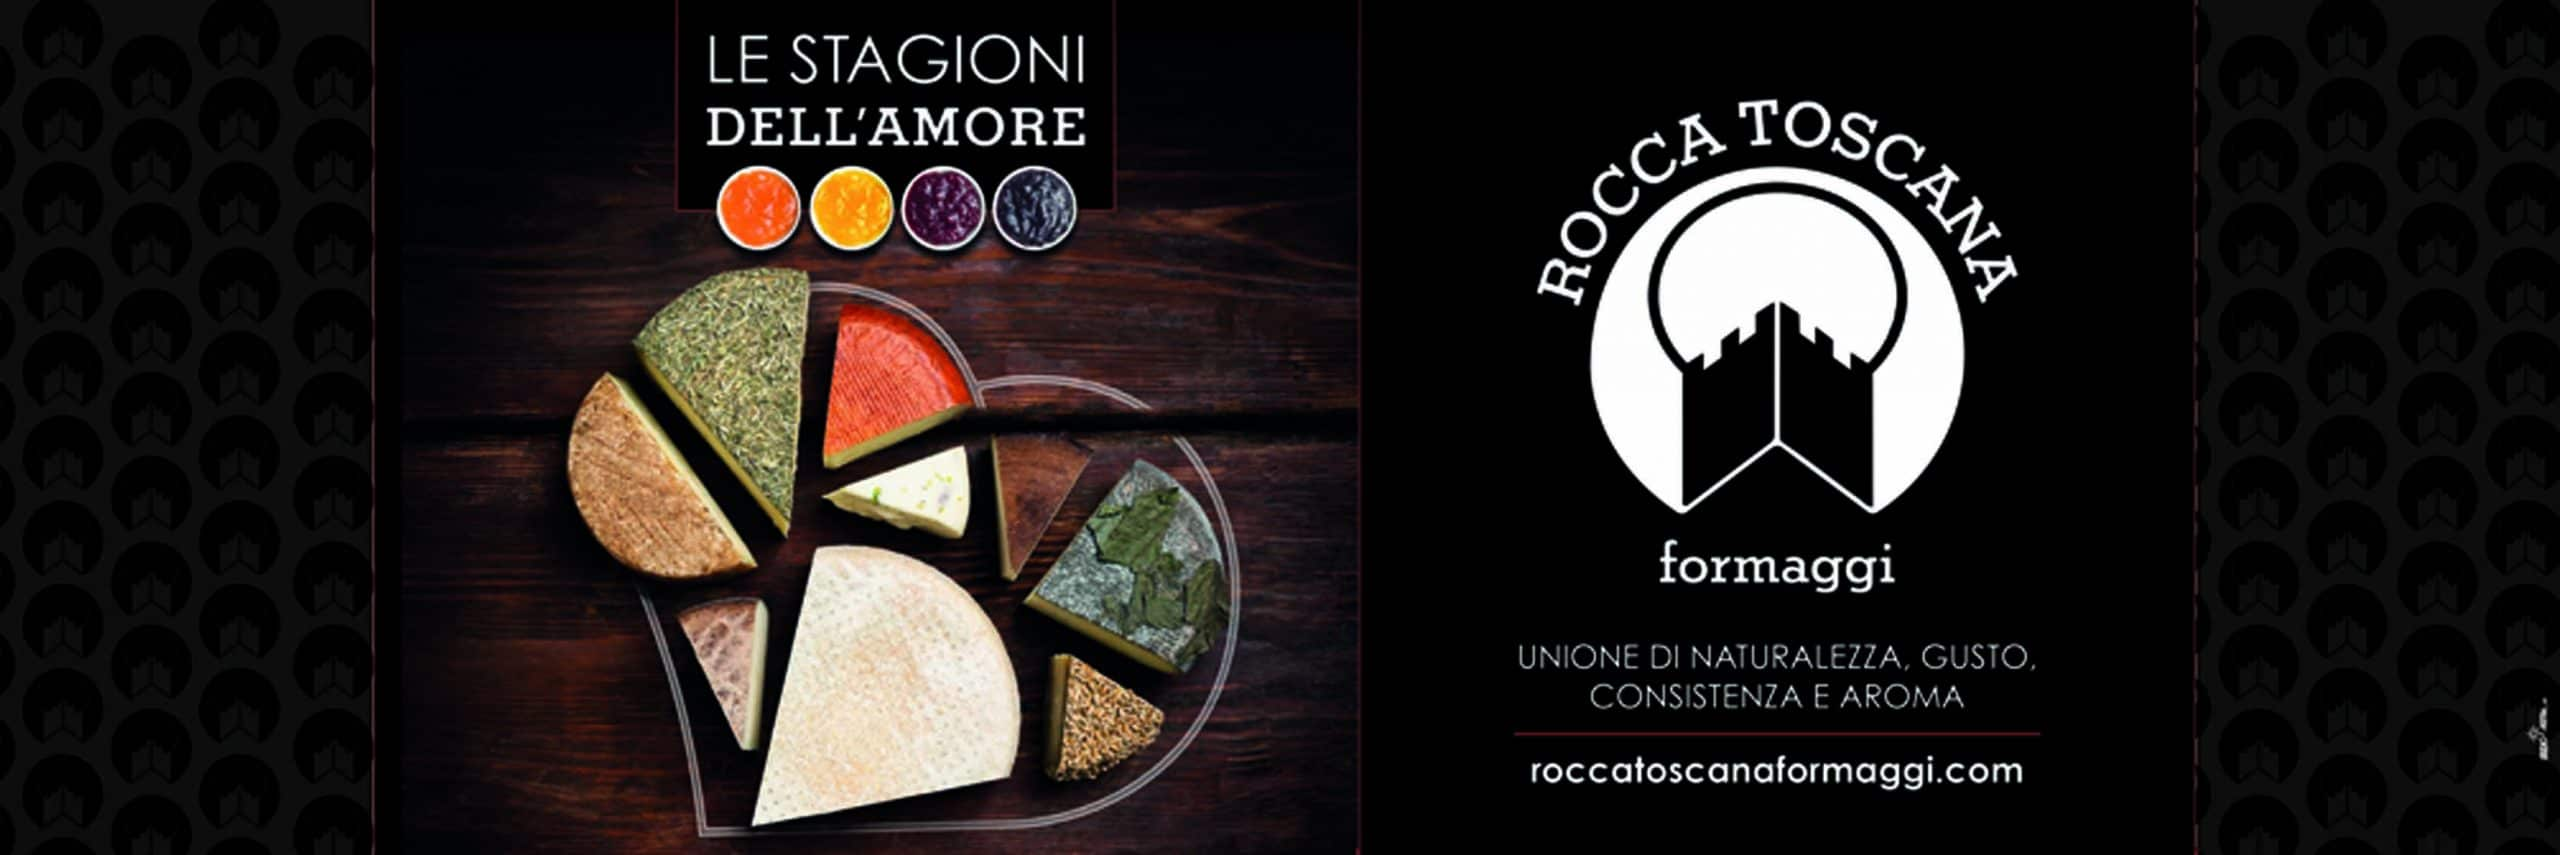 ROCCA_TOSCANA_Striscione3x1_OlmoPonte_3_2020